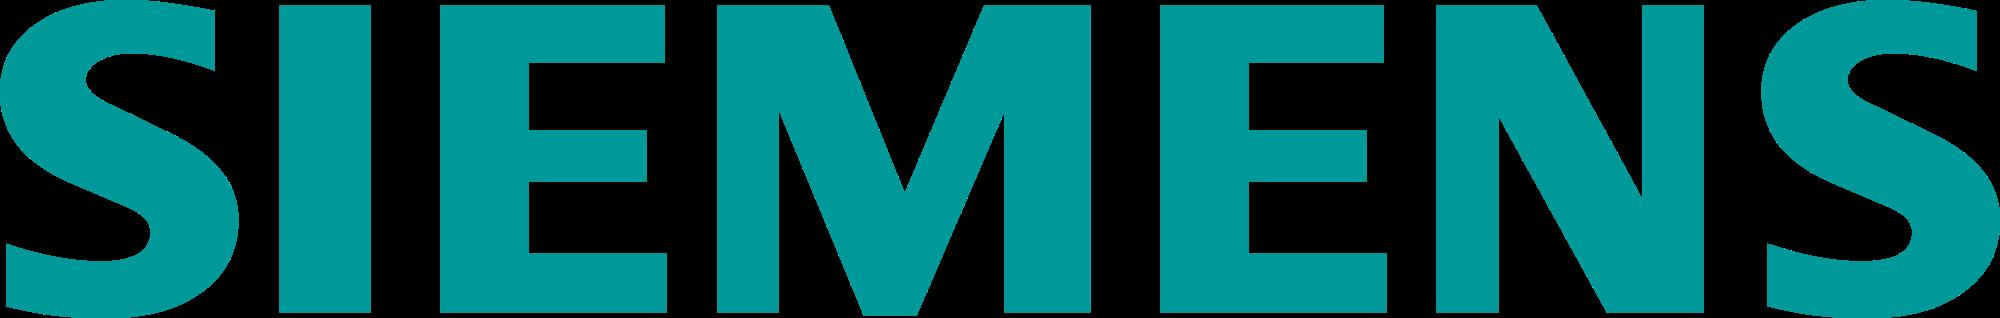 Siemens clipart library Siemens Logos library